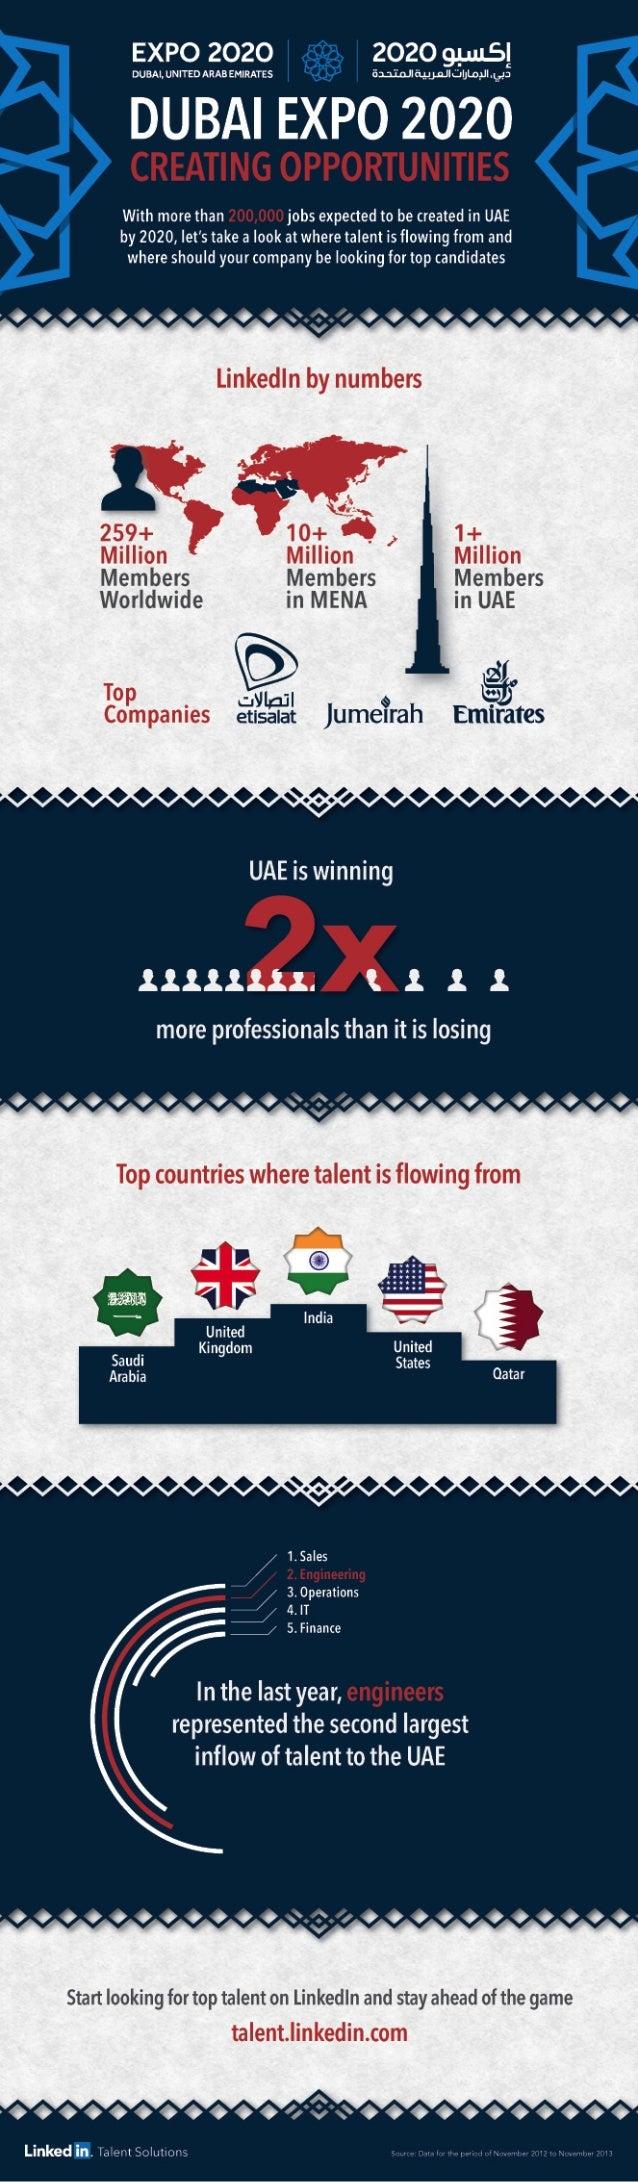 Dubai Expo 2020 | Infographic